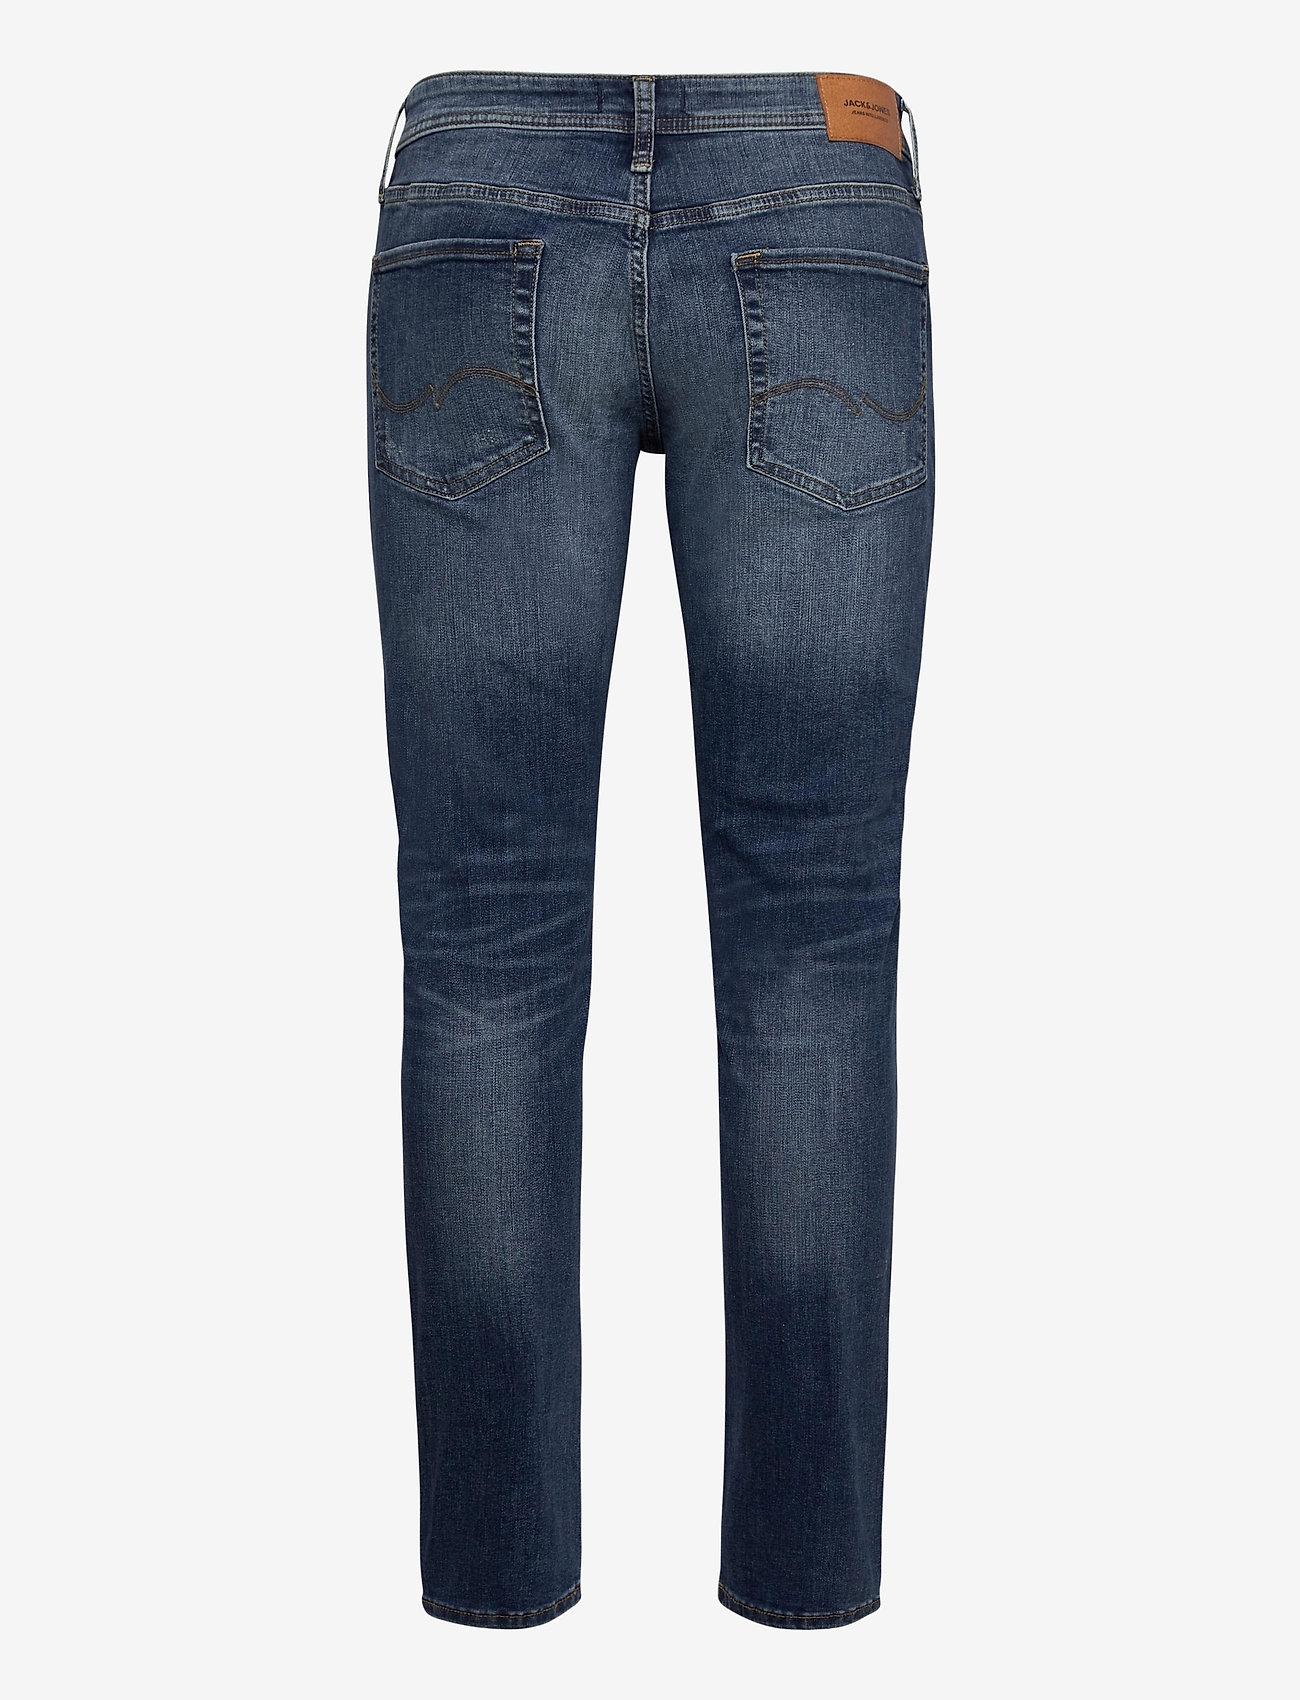 Jack & Jones - JJIGLENN JJORIGINAL AGI 035 50SPS - slim jeans - blue denim - 1